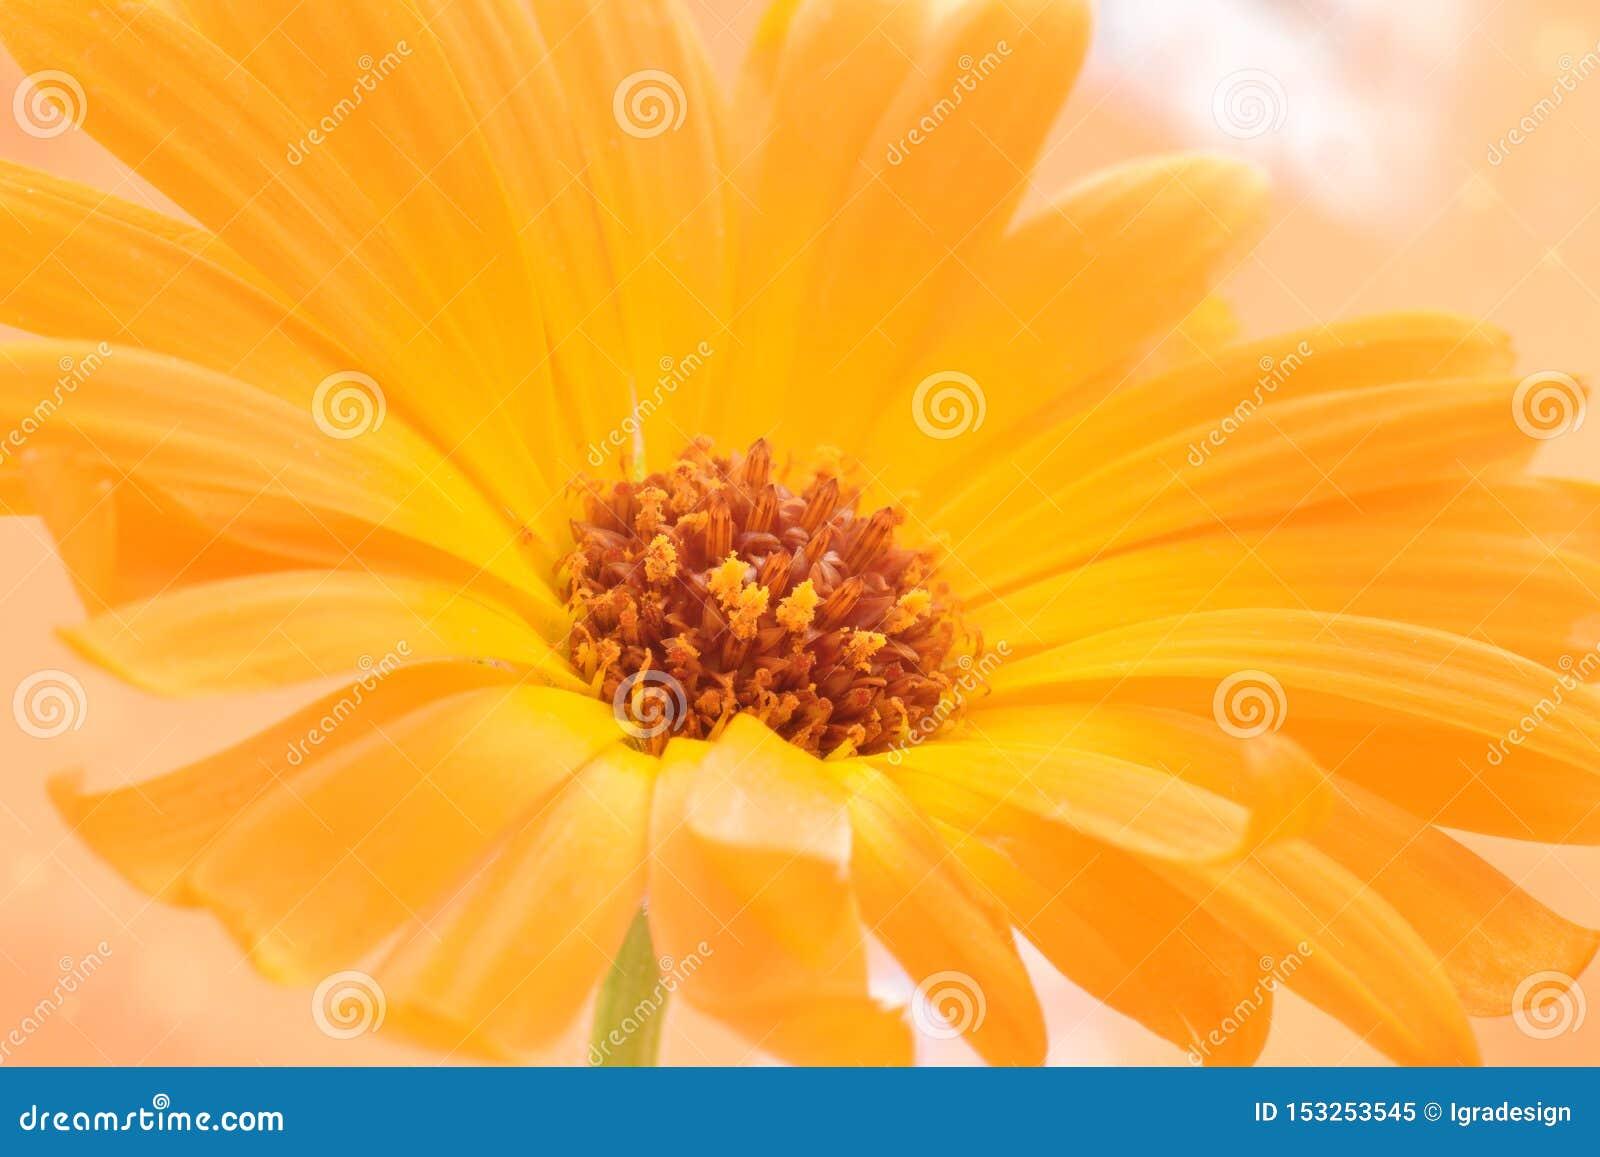 Flor do Calendula fechada acima do fundo bonito da natureza